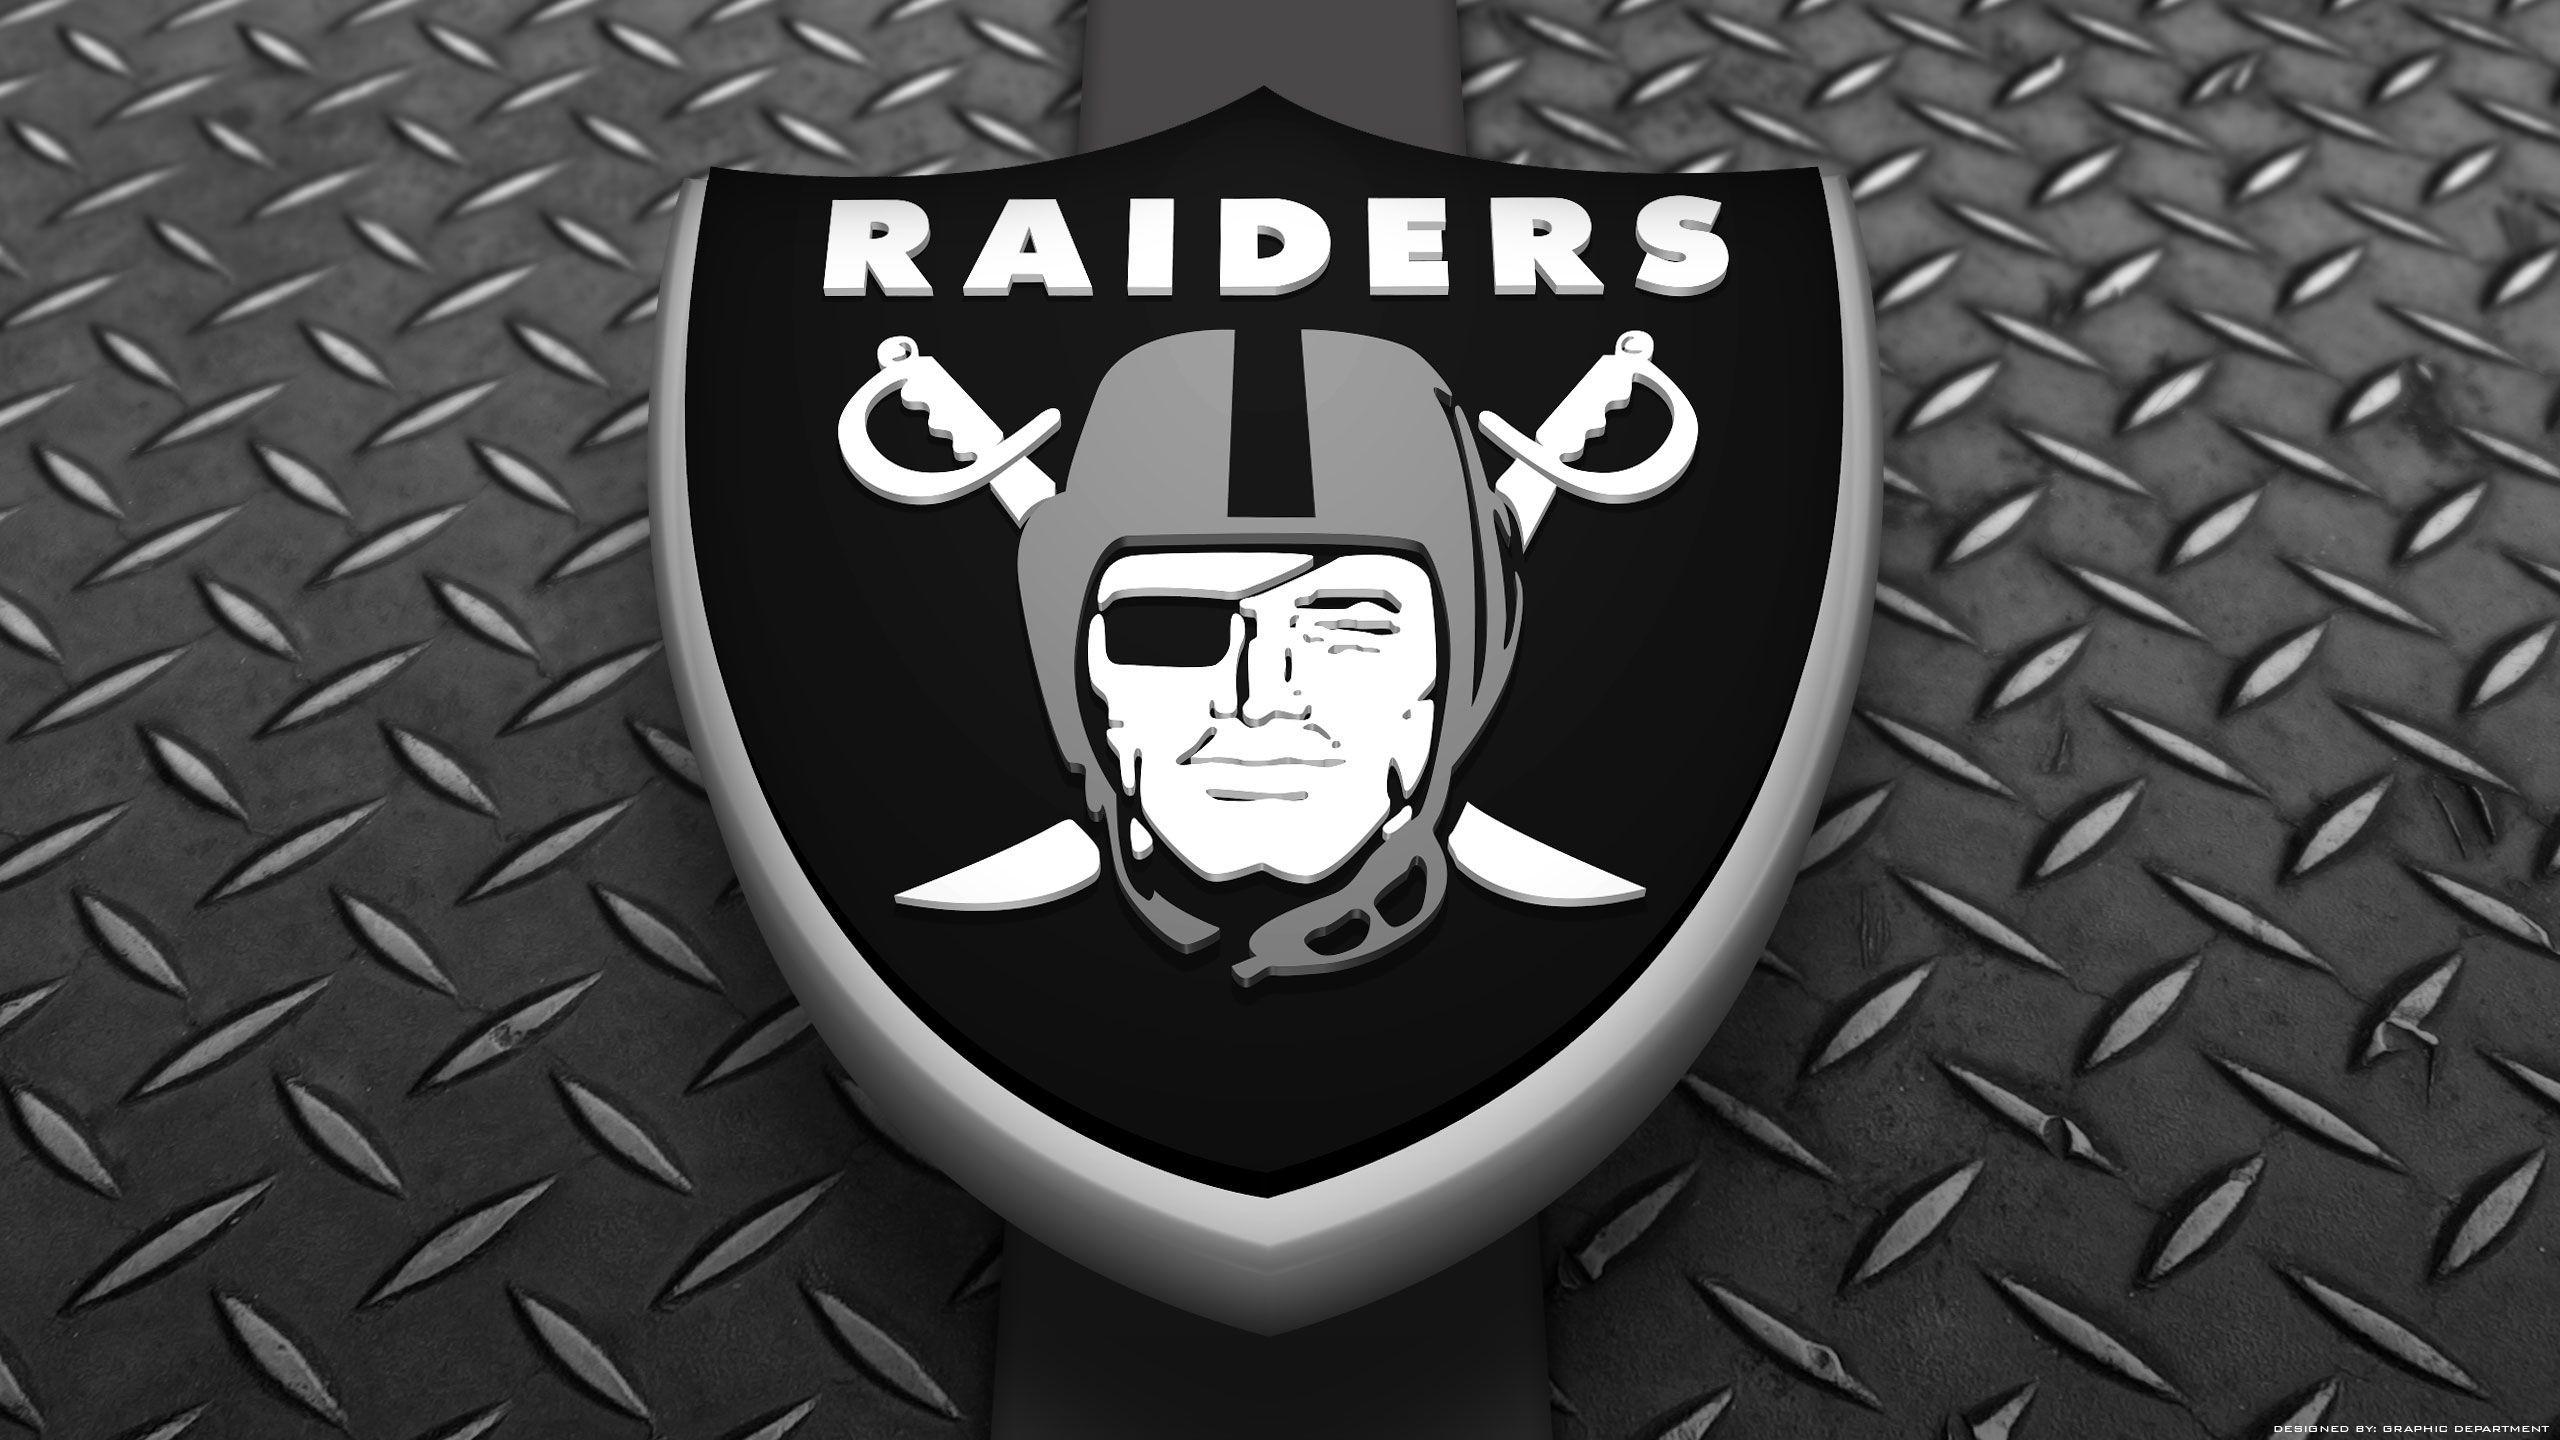 Pin by John on Raiders 4 Life!!!!!! Oakland raiders